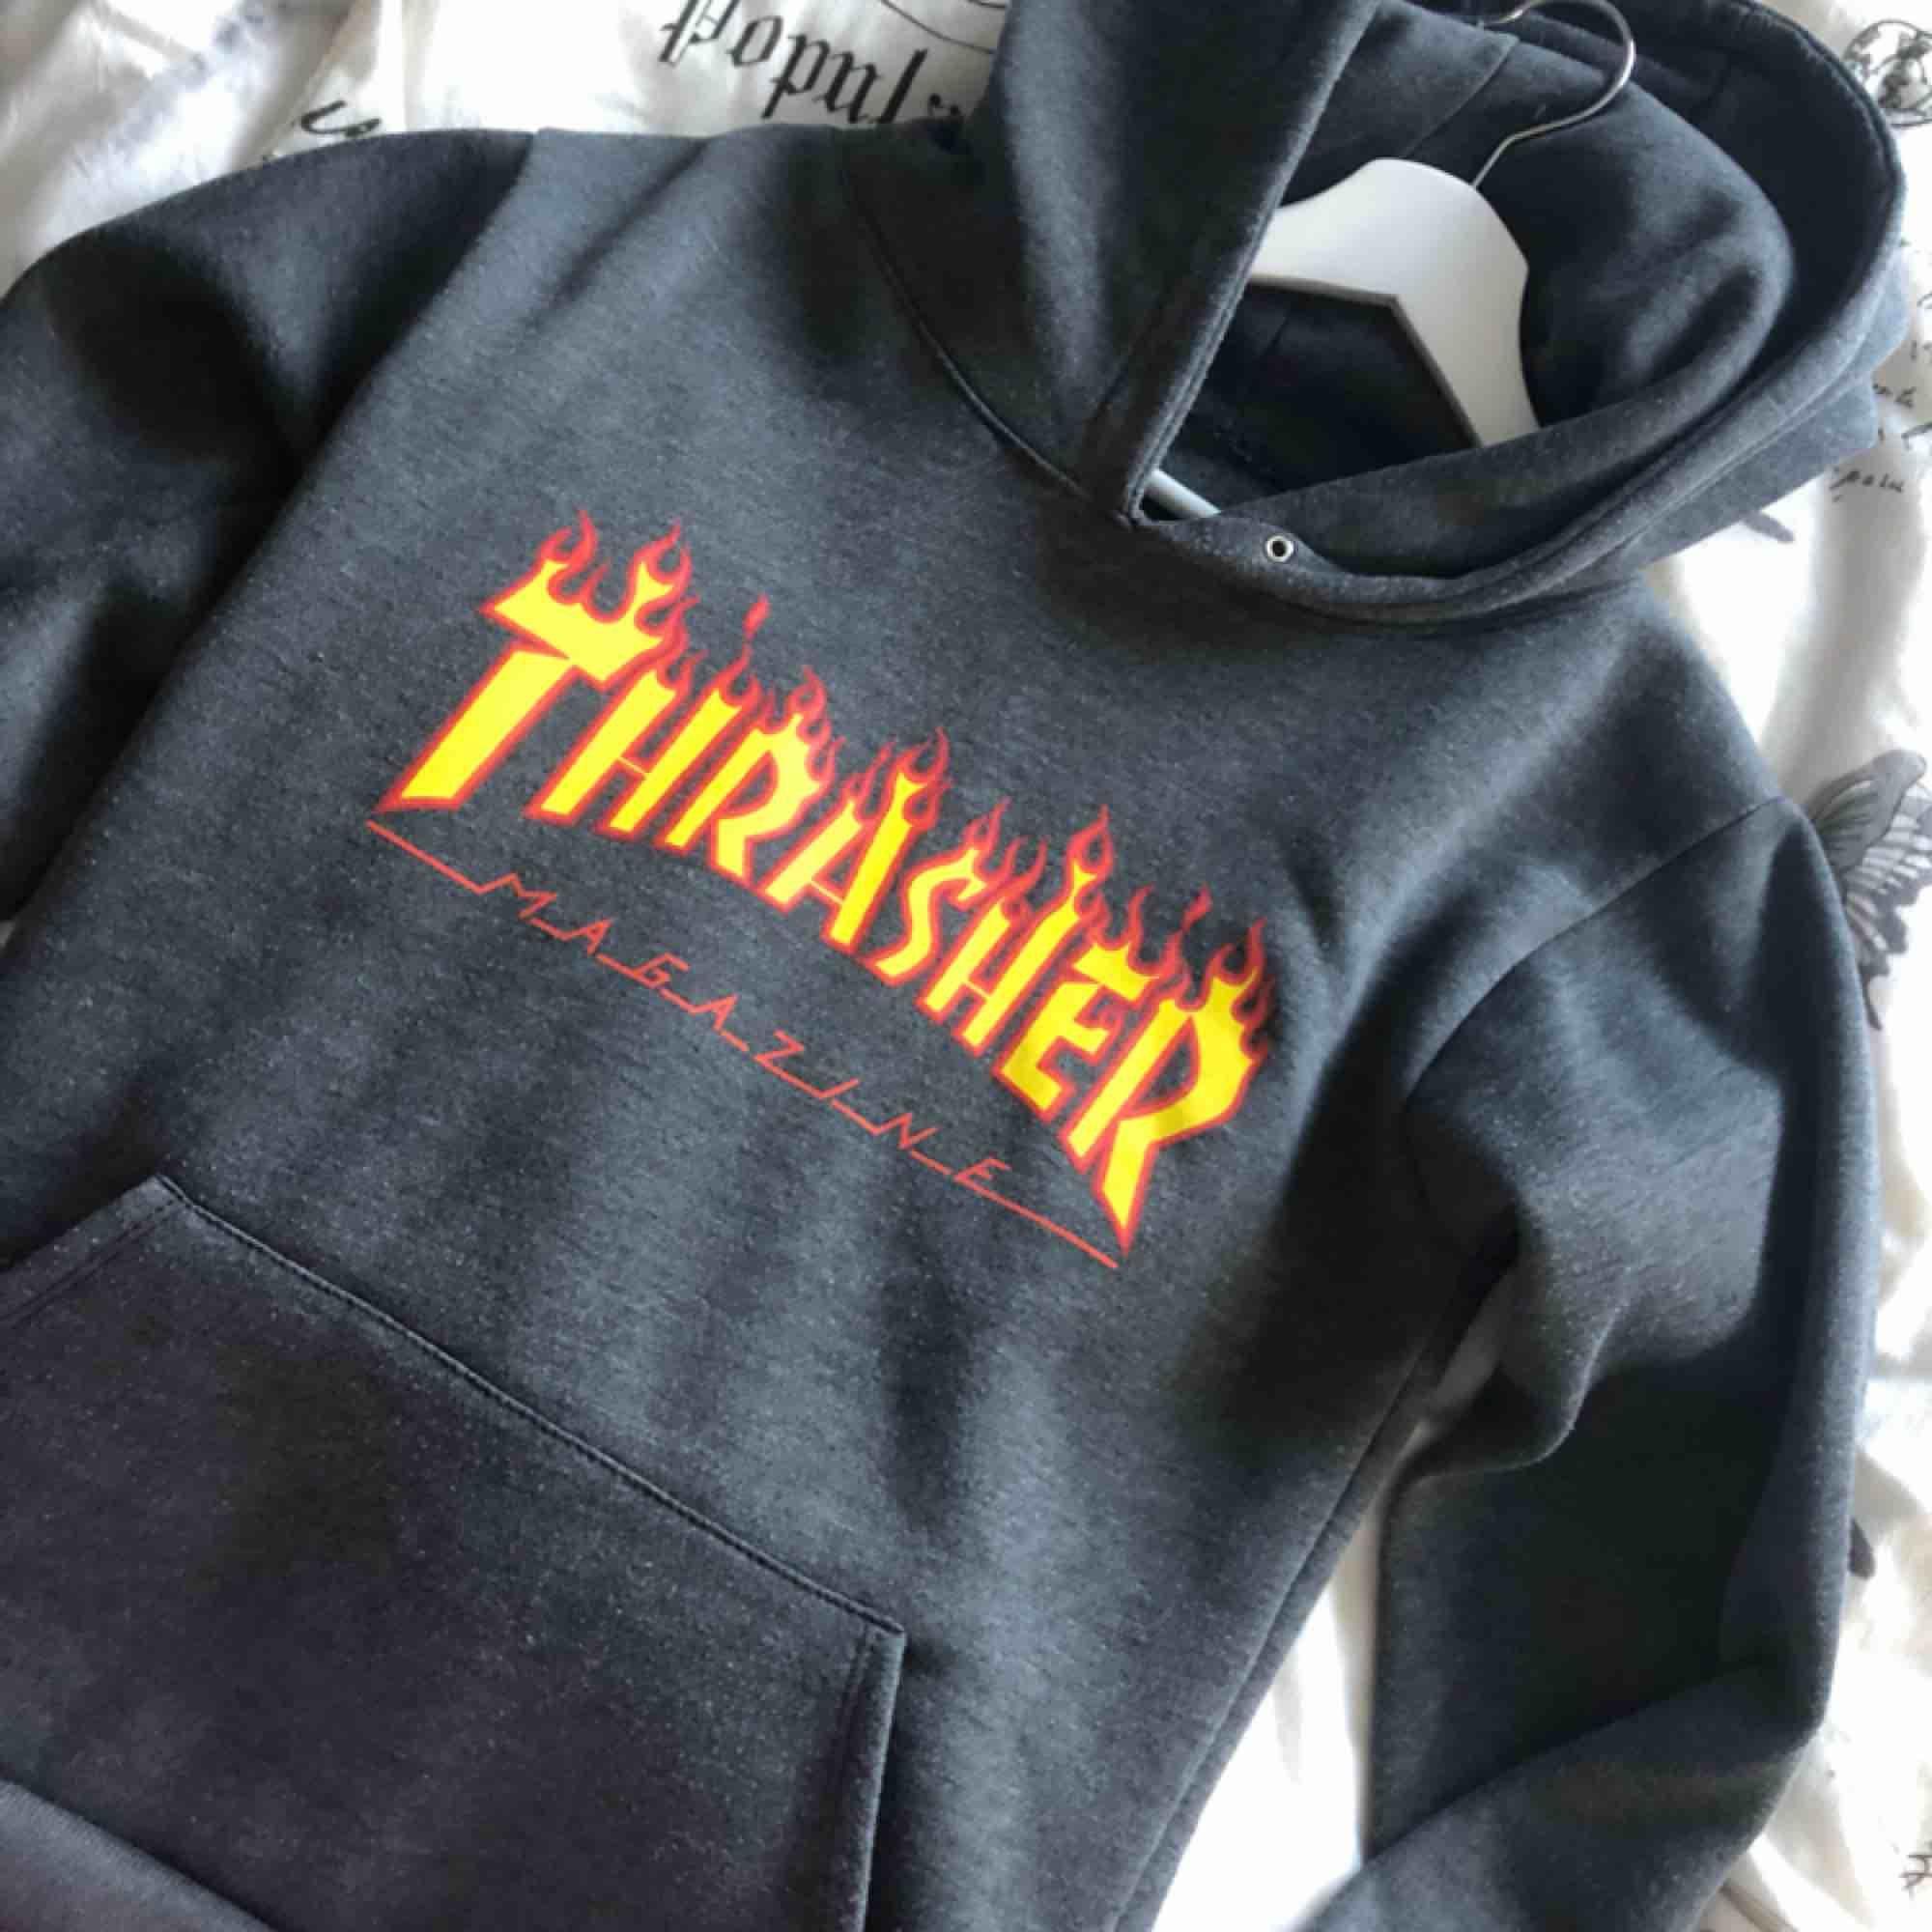 Trasher hoodie (intw äkta). Tröjor & Koftor.